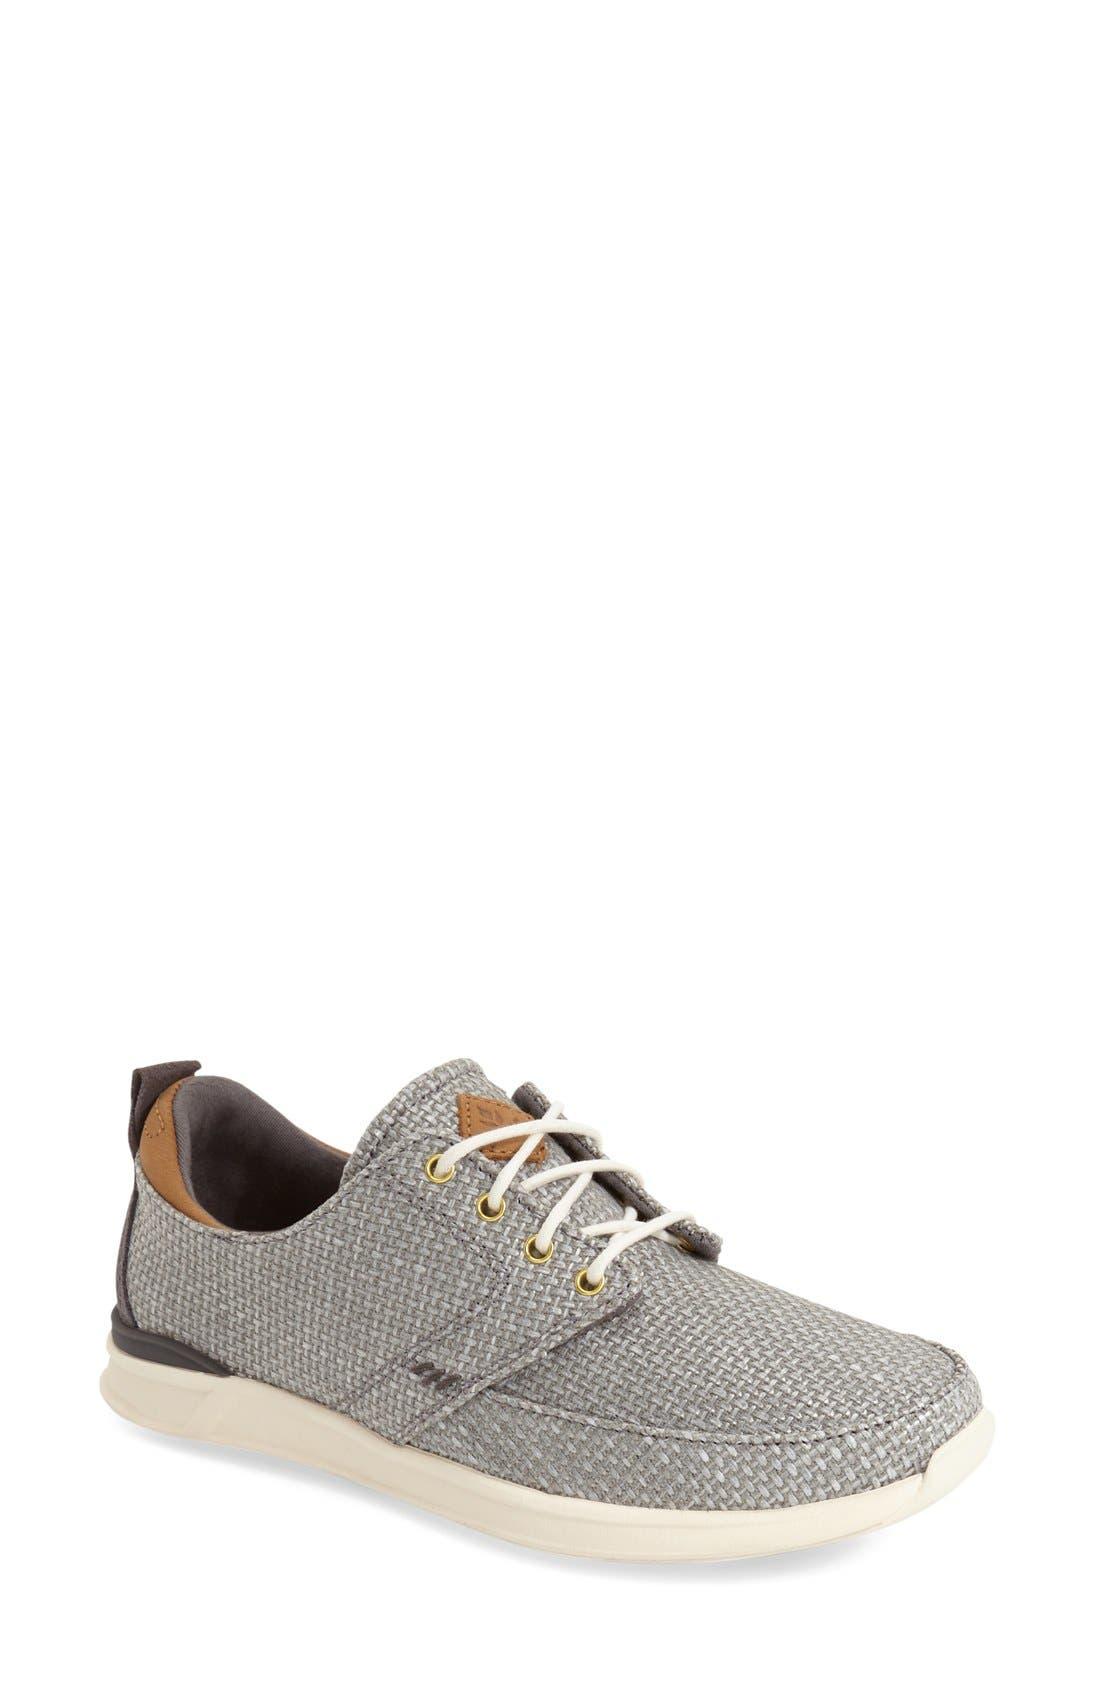 Main Image - Reef 'Rover Low' Sneaker (Women)